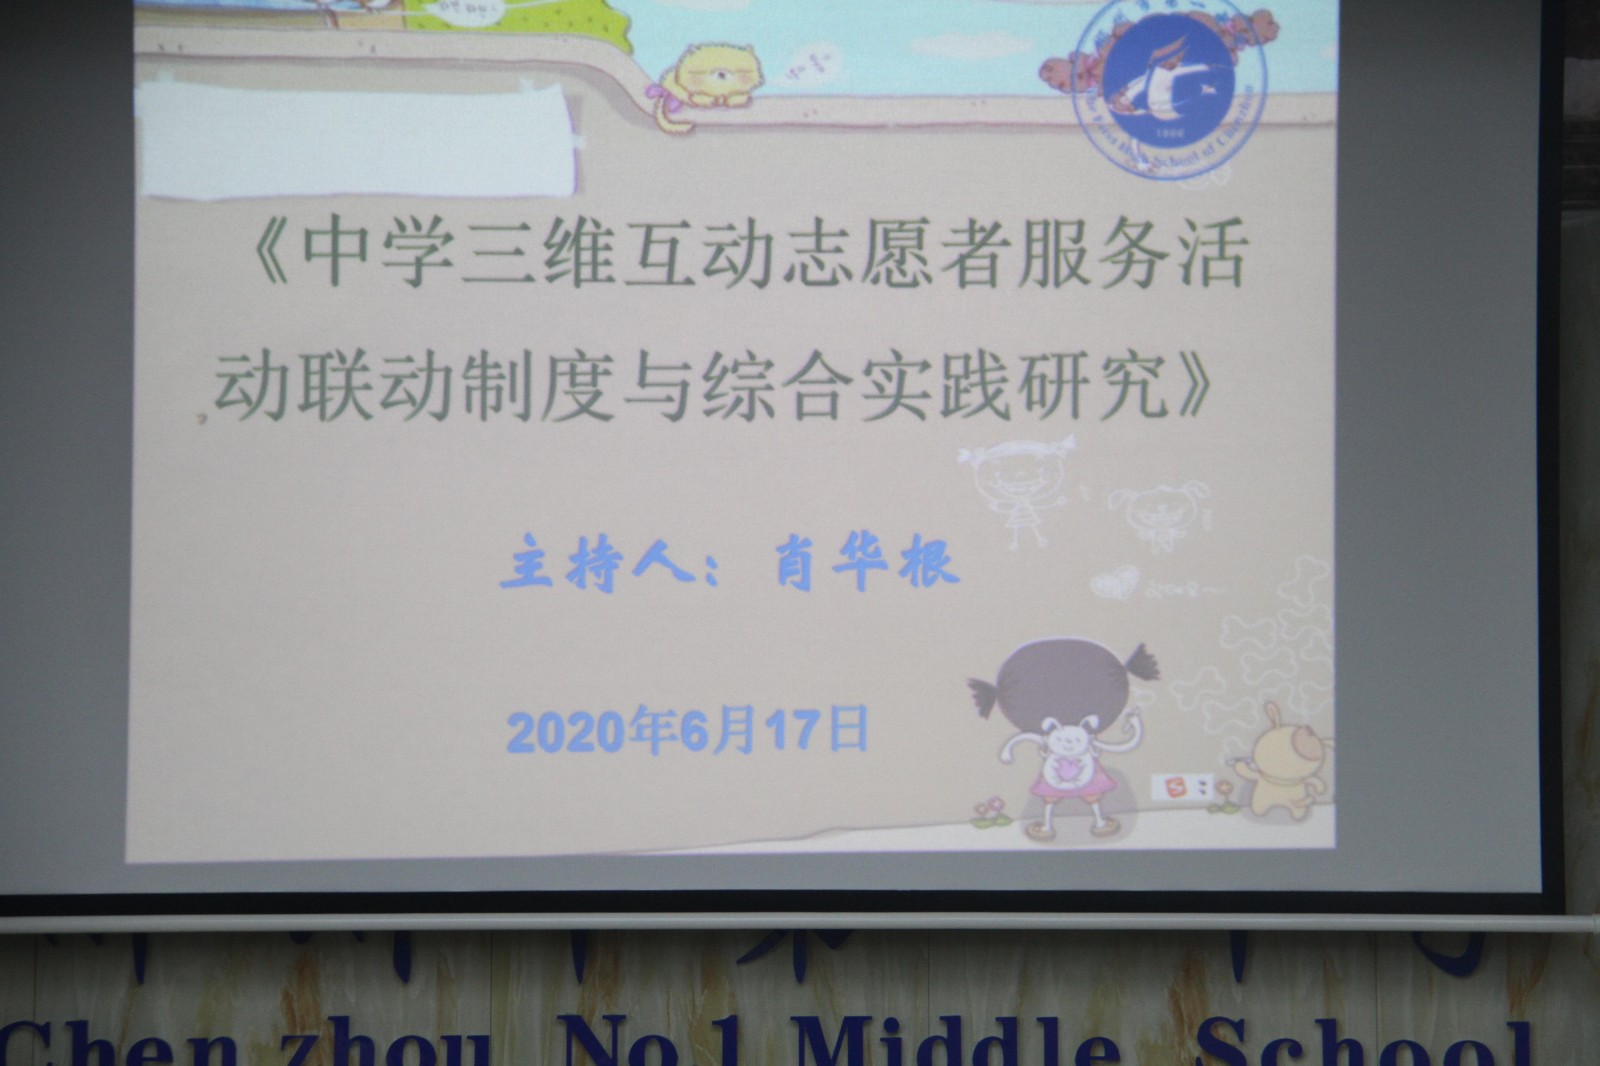 IMG_3418_爱奇艺.jpg